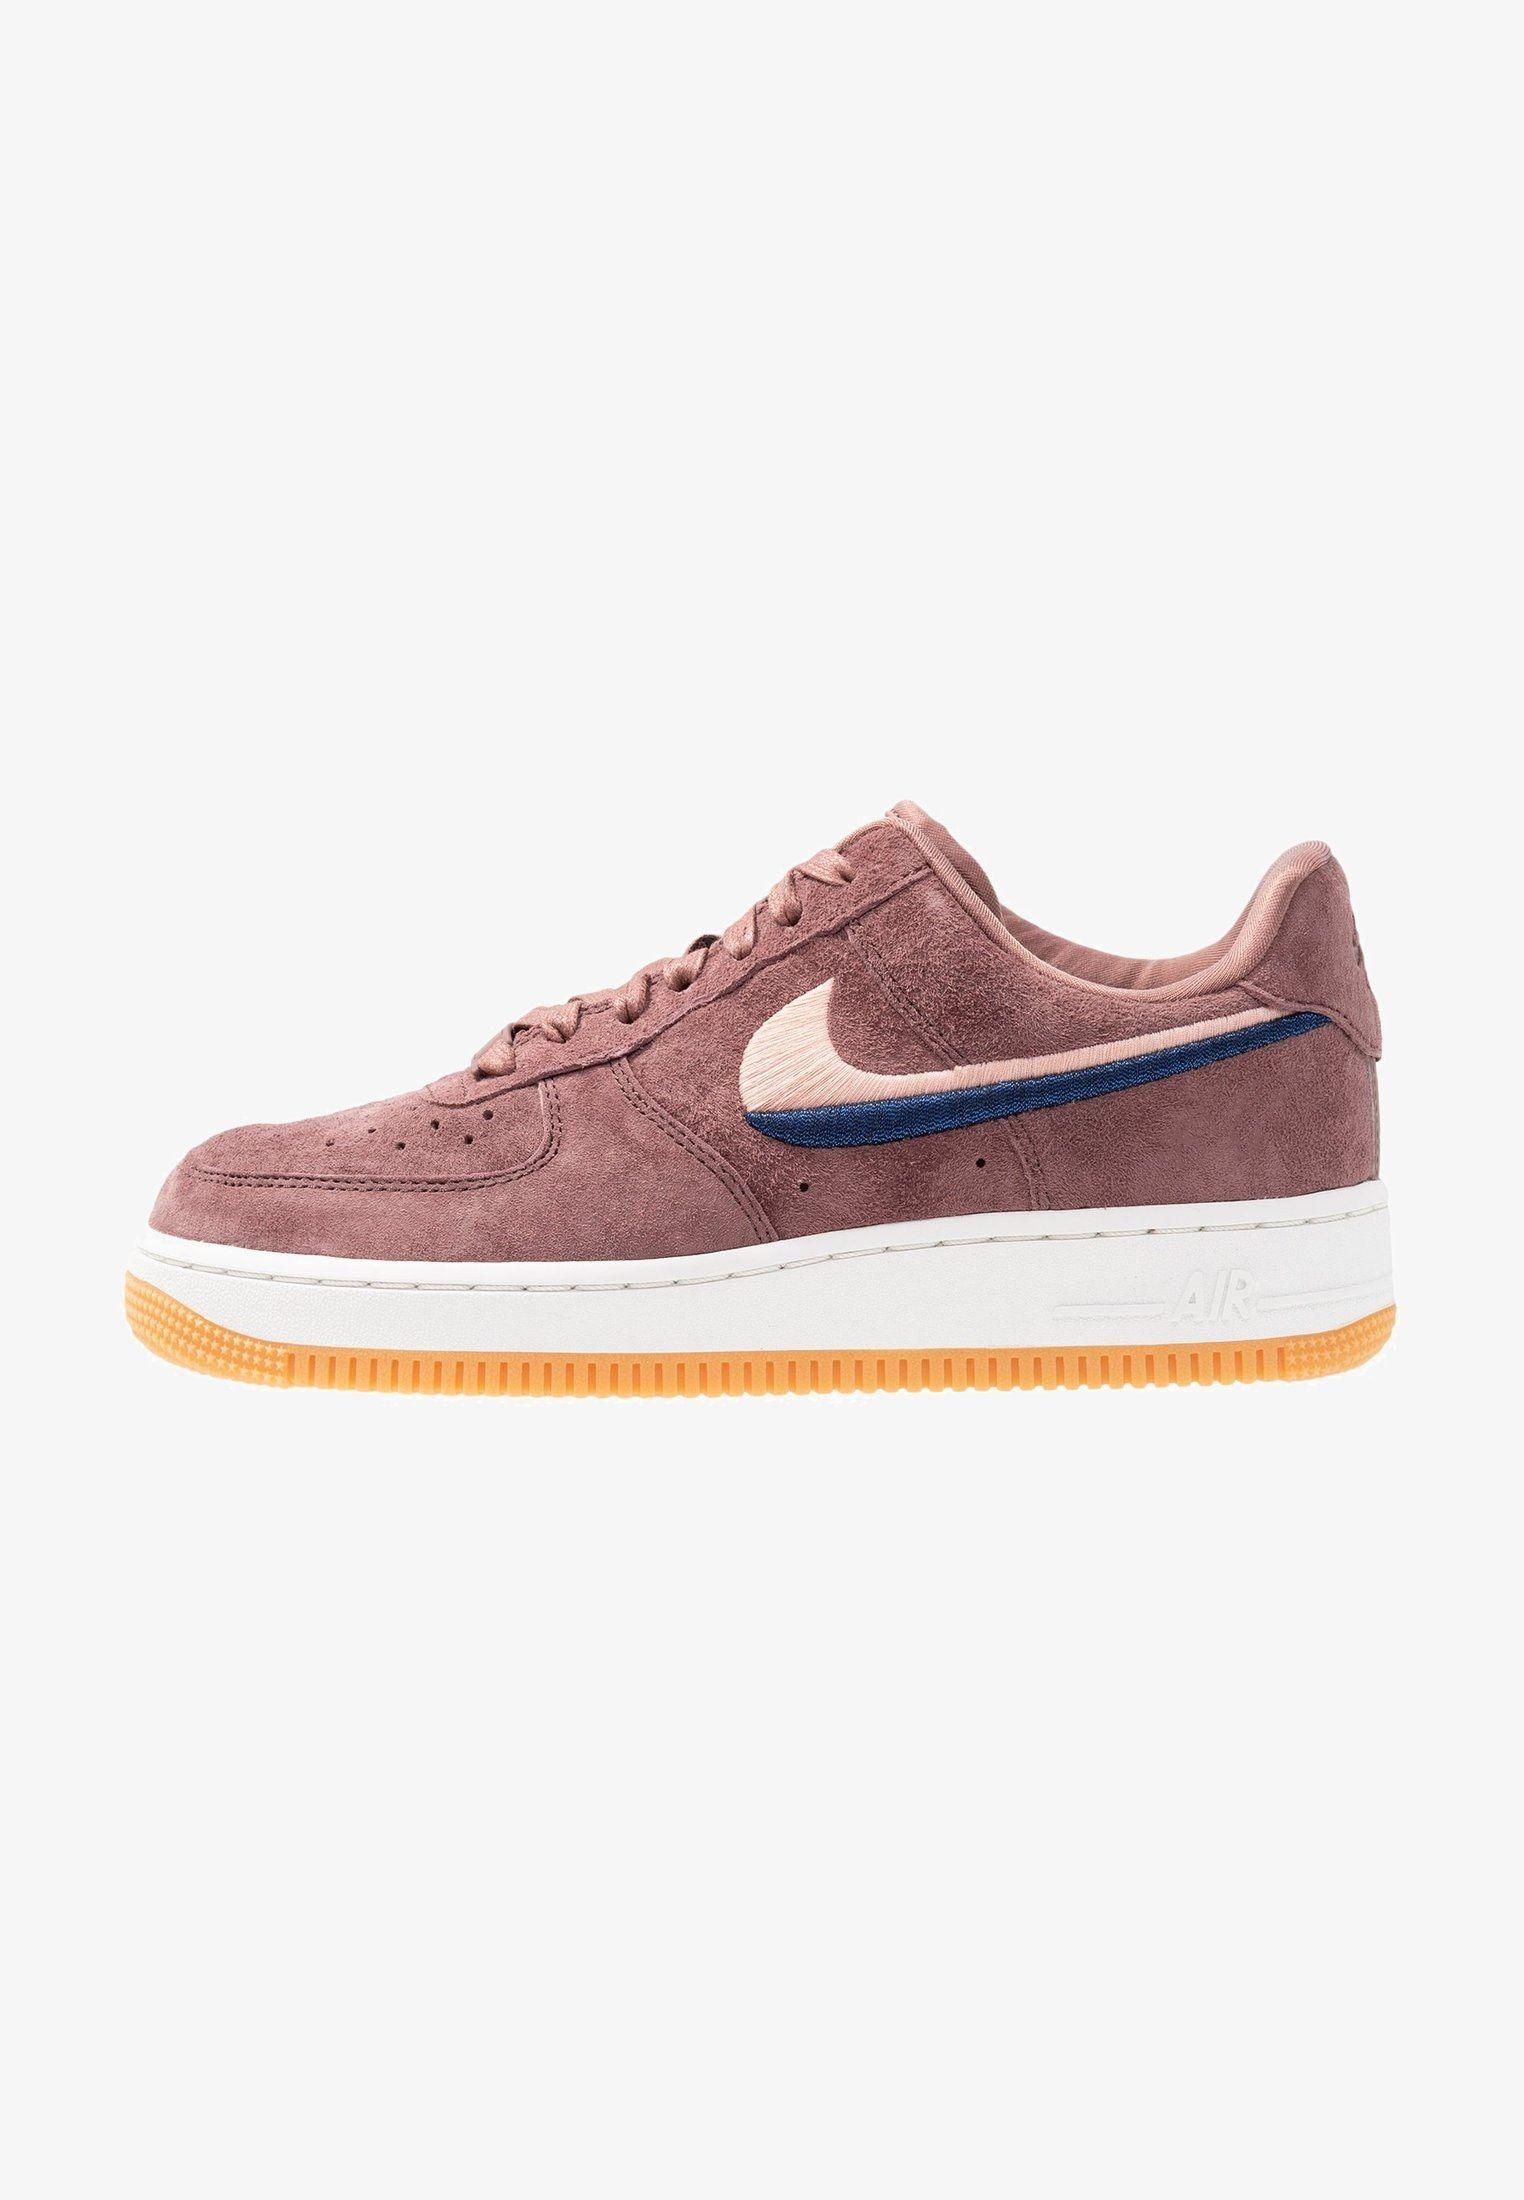 8ec3011a0d1494 Nike Sportswear AIR FORCE 1  07 LX - Sneakers - smokey mauve summit white